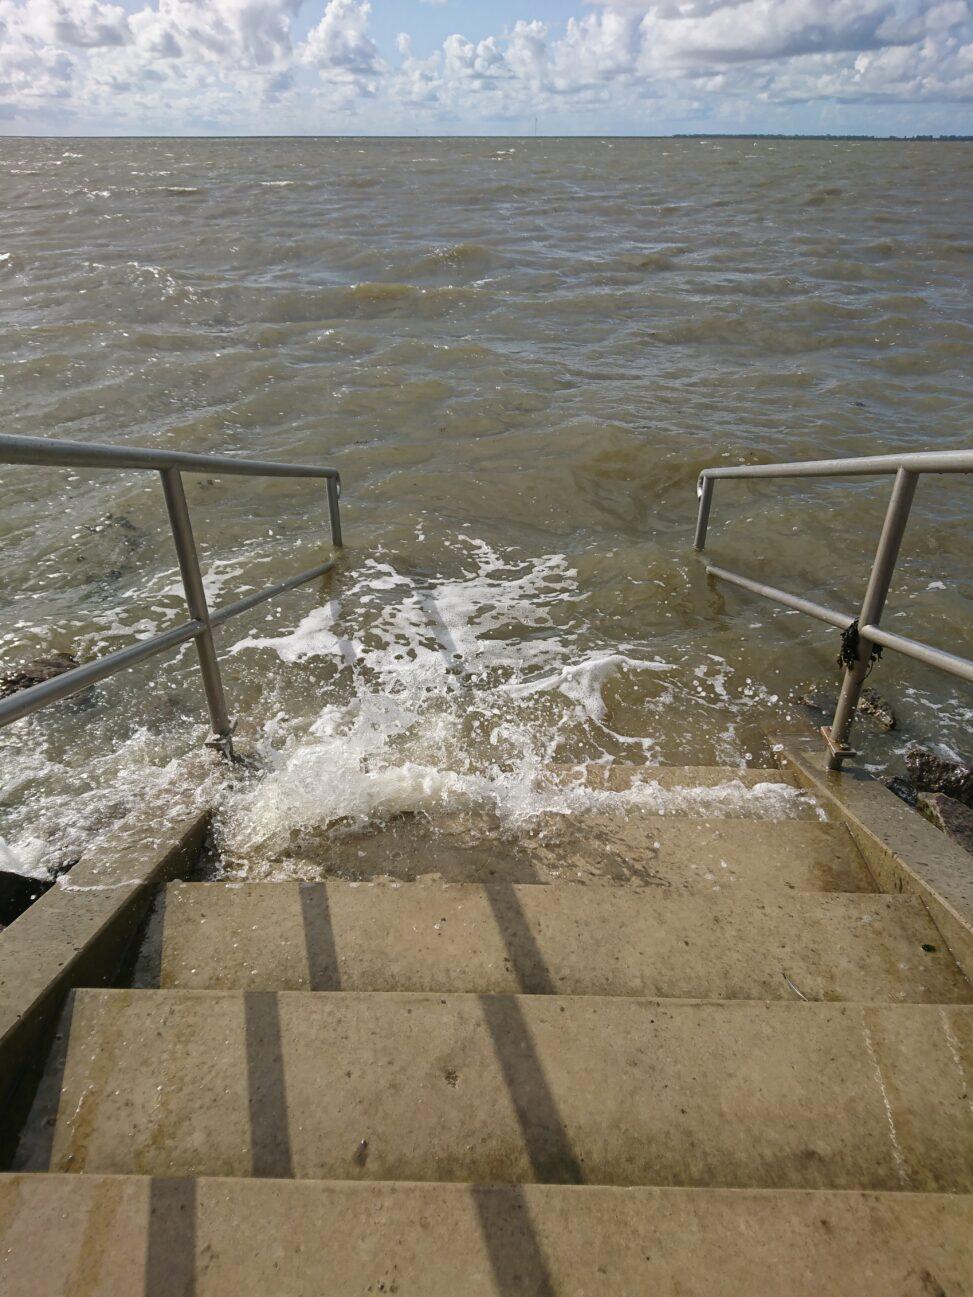 Abstieg Badestelle Wesselburenerkoog